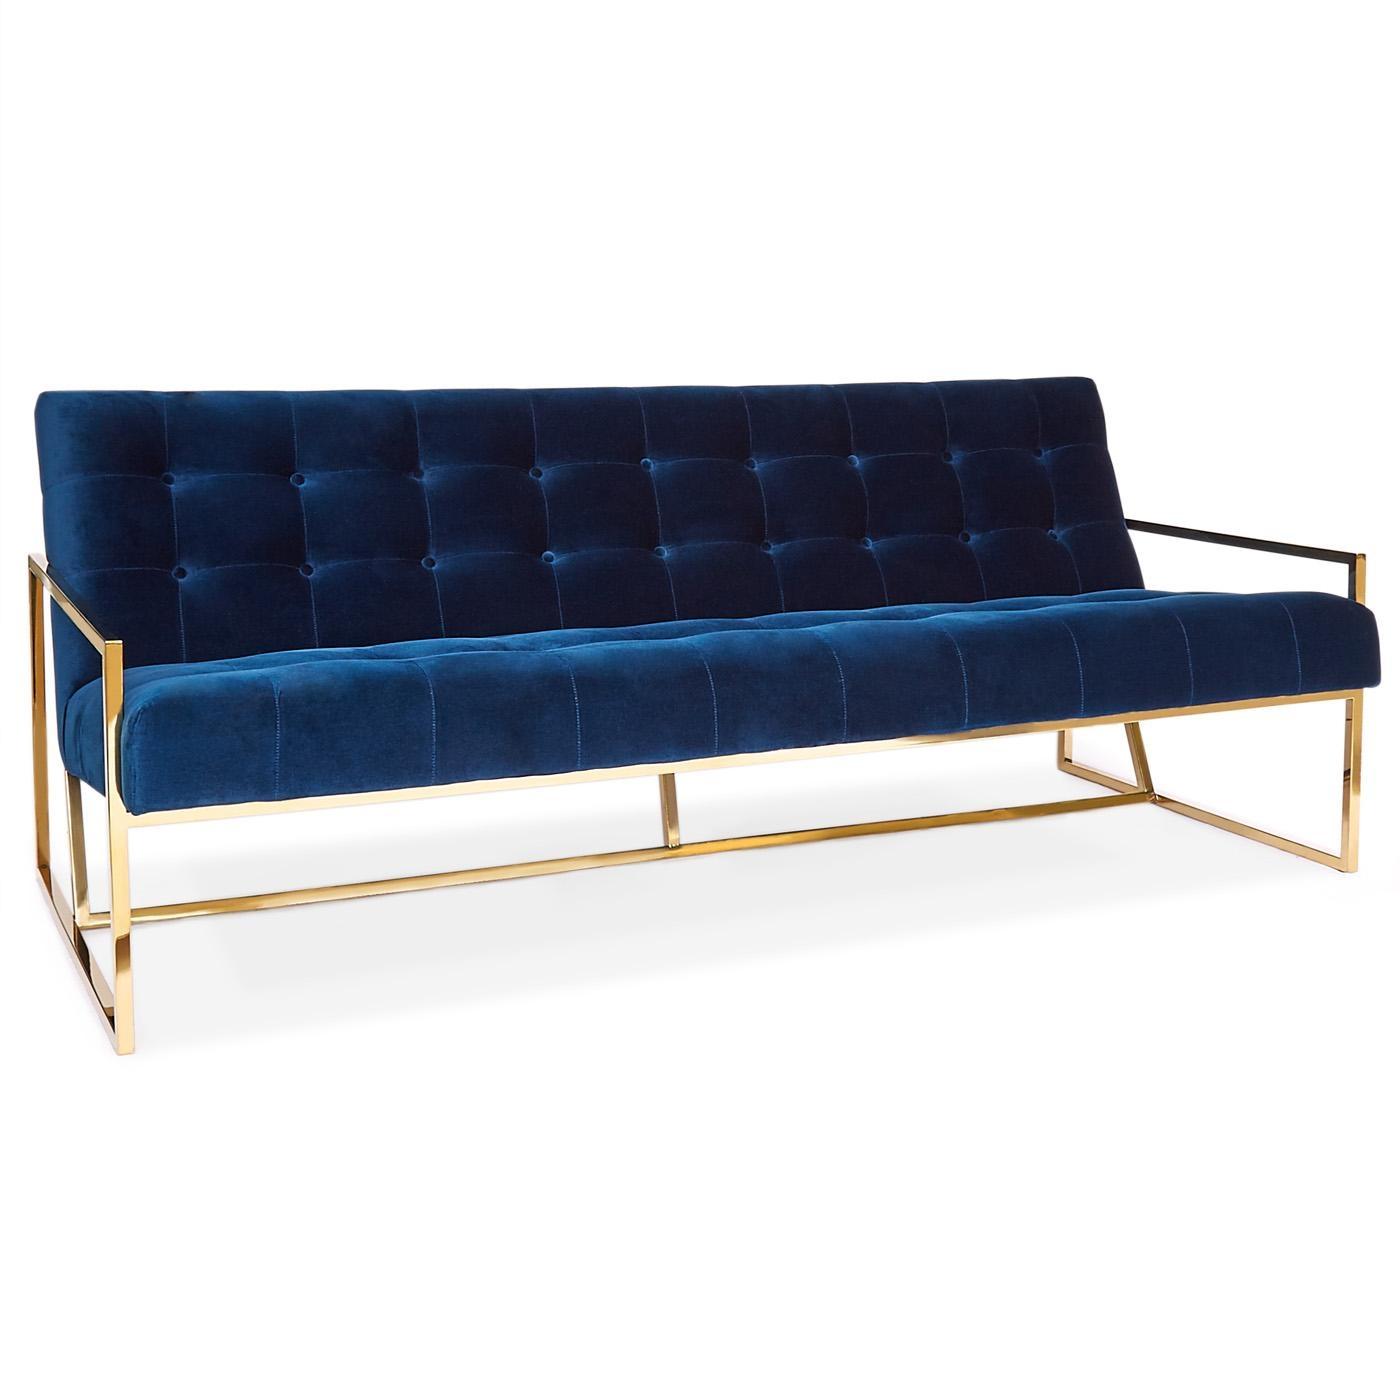 Goldfinger Apartment Sofa | Modern Furniture | Jonathan Adler In Jonathan Sofa (Image 6 of 20)